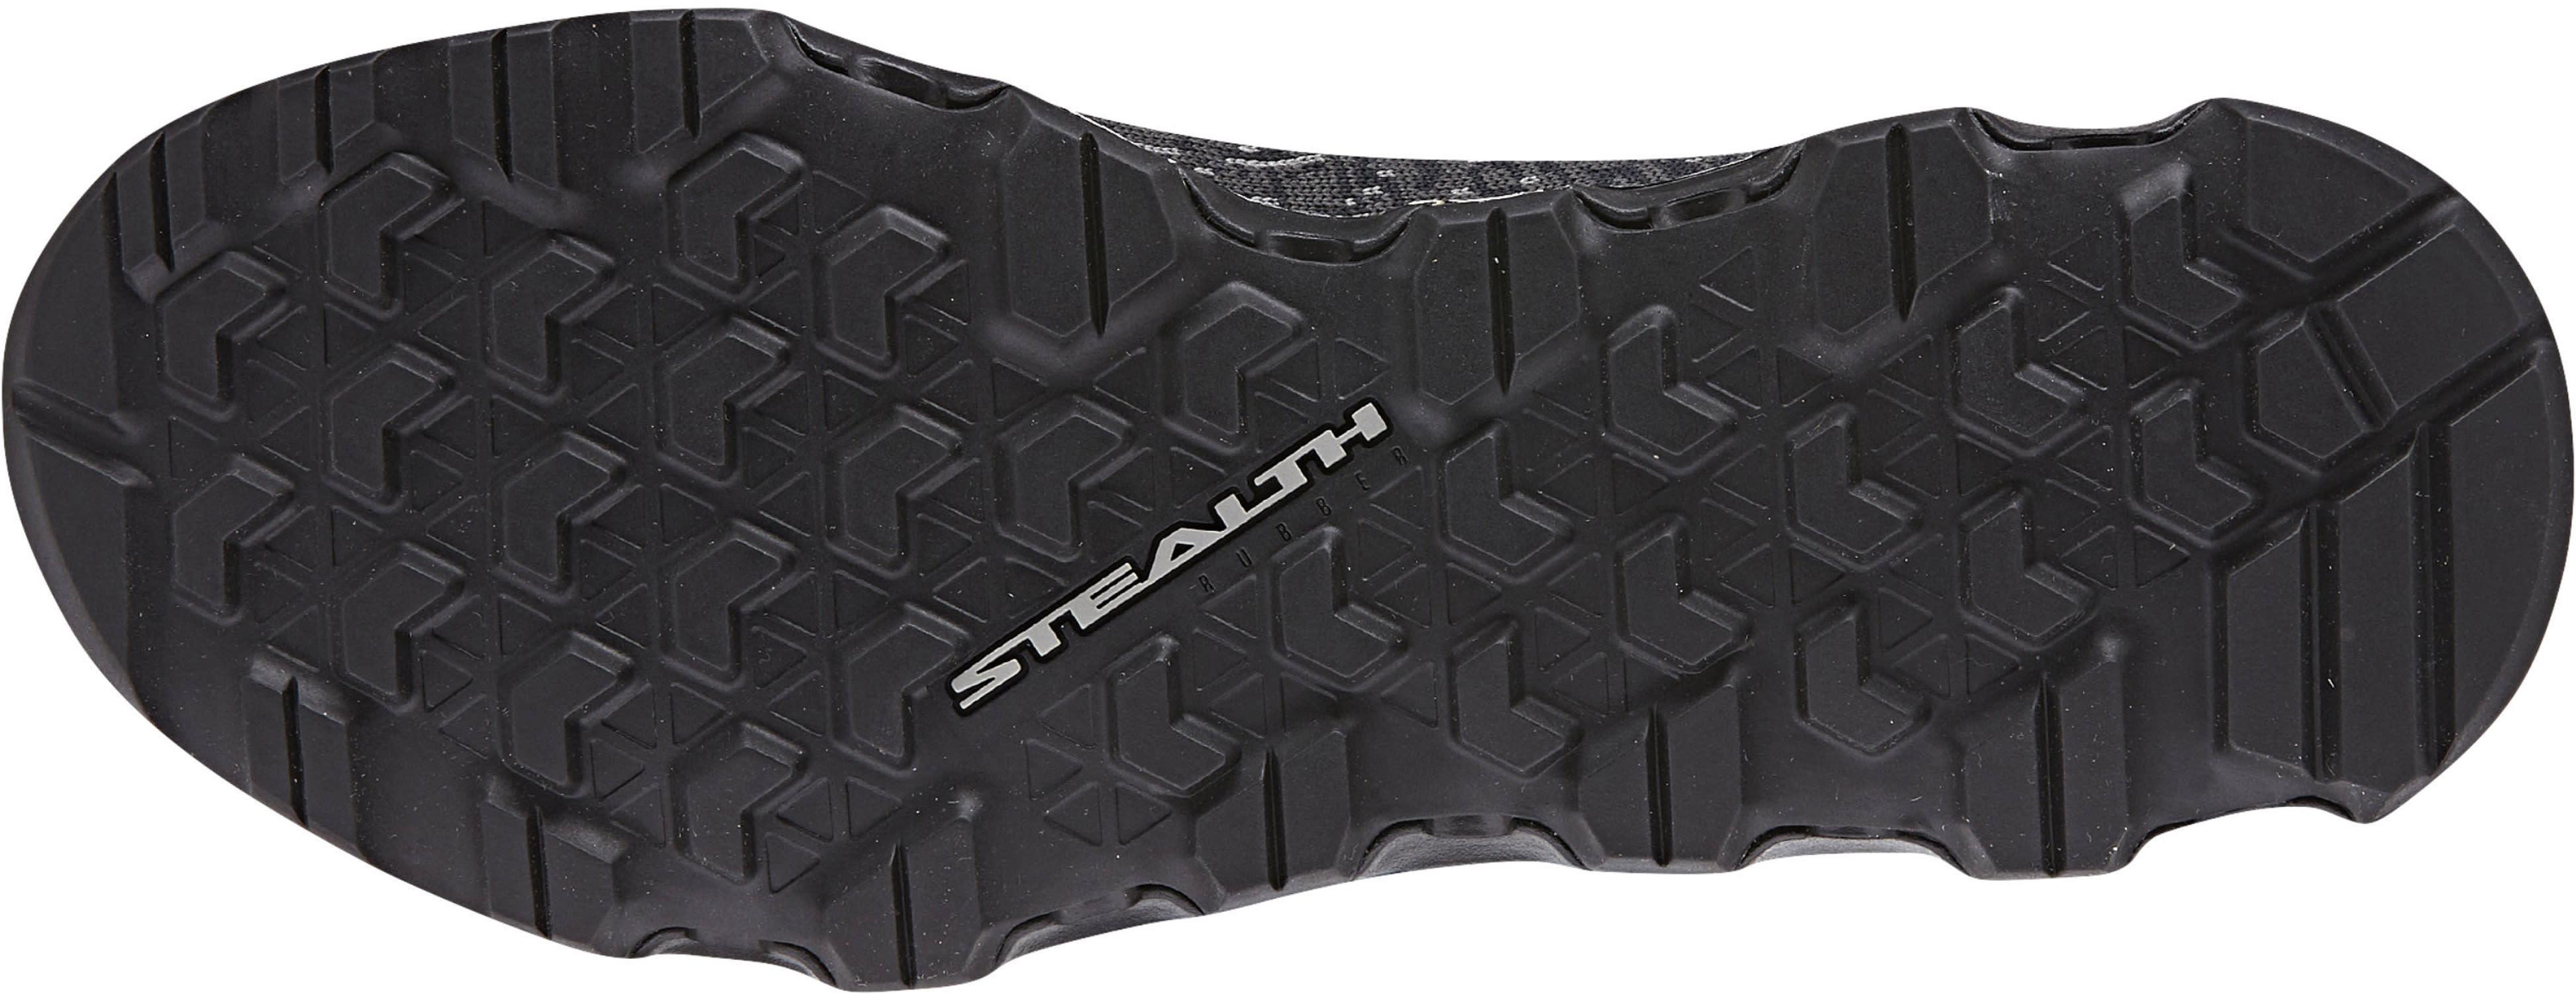 0d0f65780bd Adidas Terrex CC Voyager Parley Boat Shoes - thumbnail 2